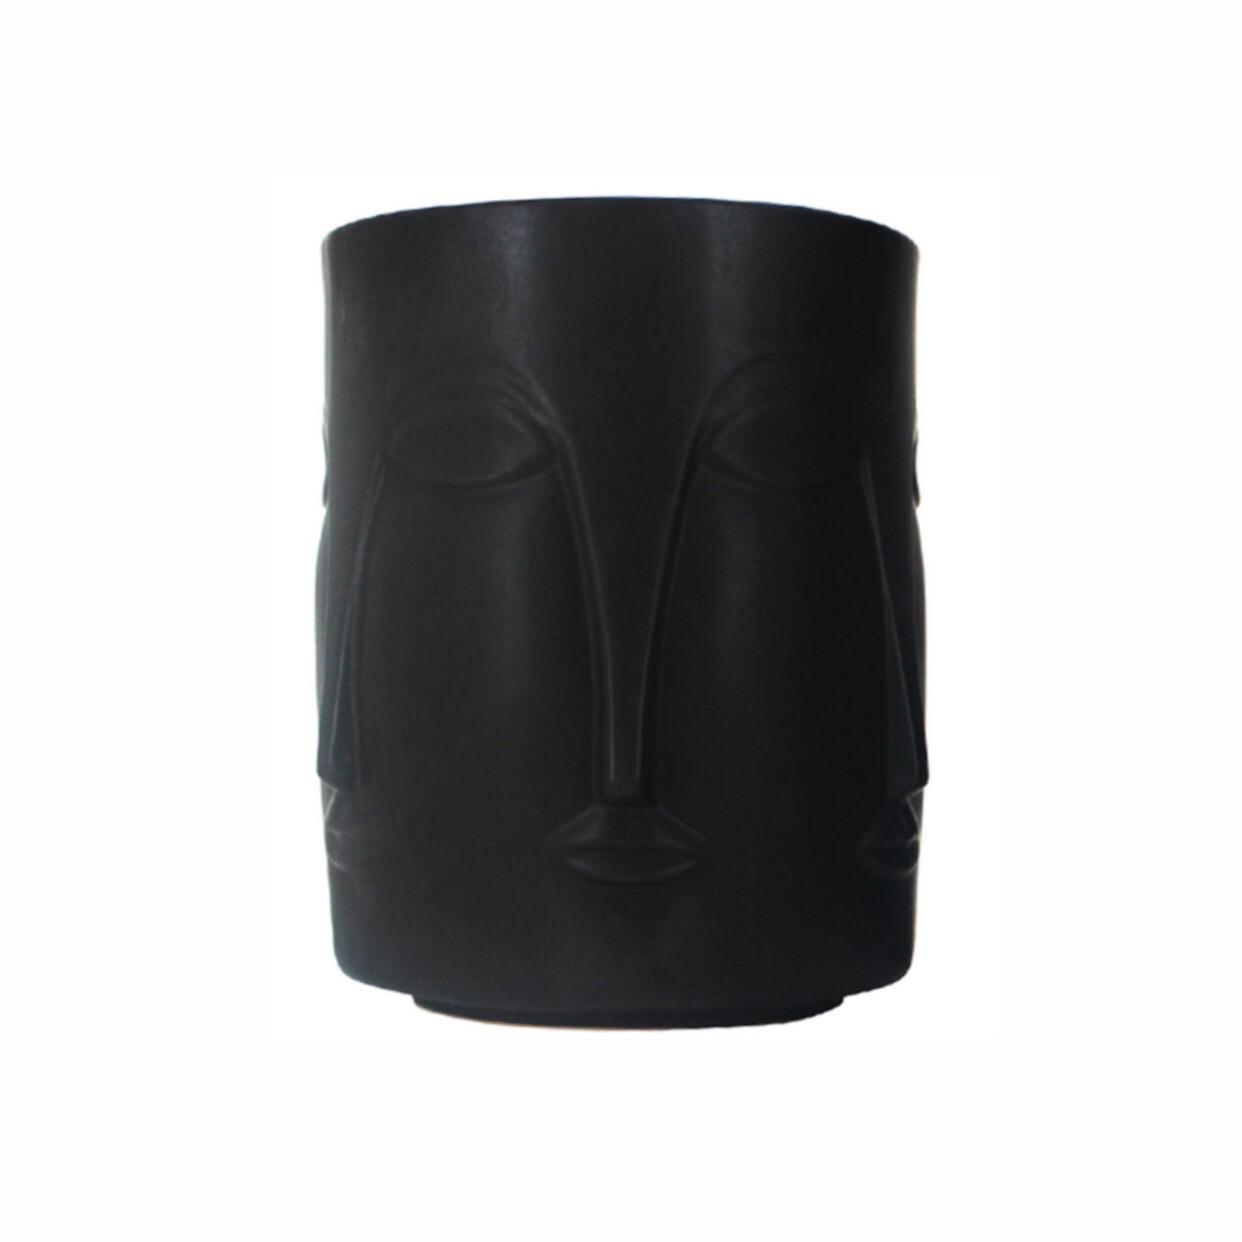 CHAGALL CERAMIC FACE PLANTER - BLACK